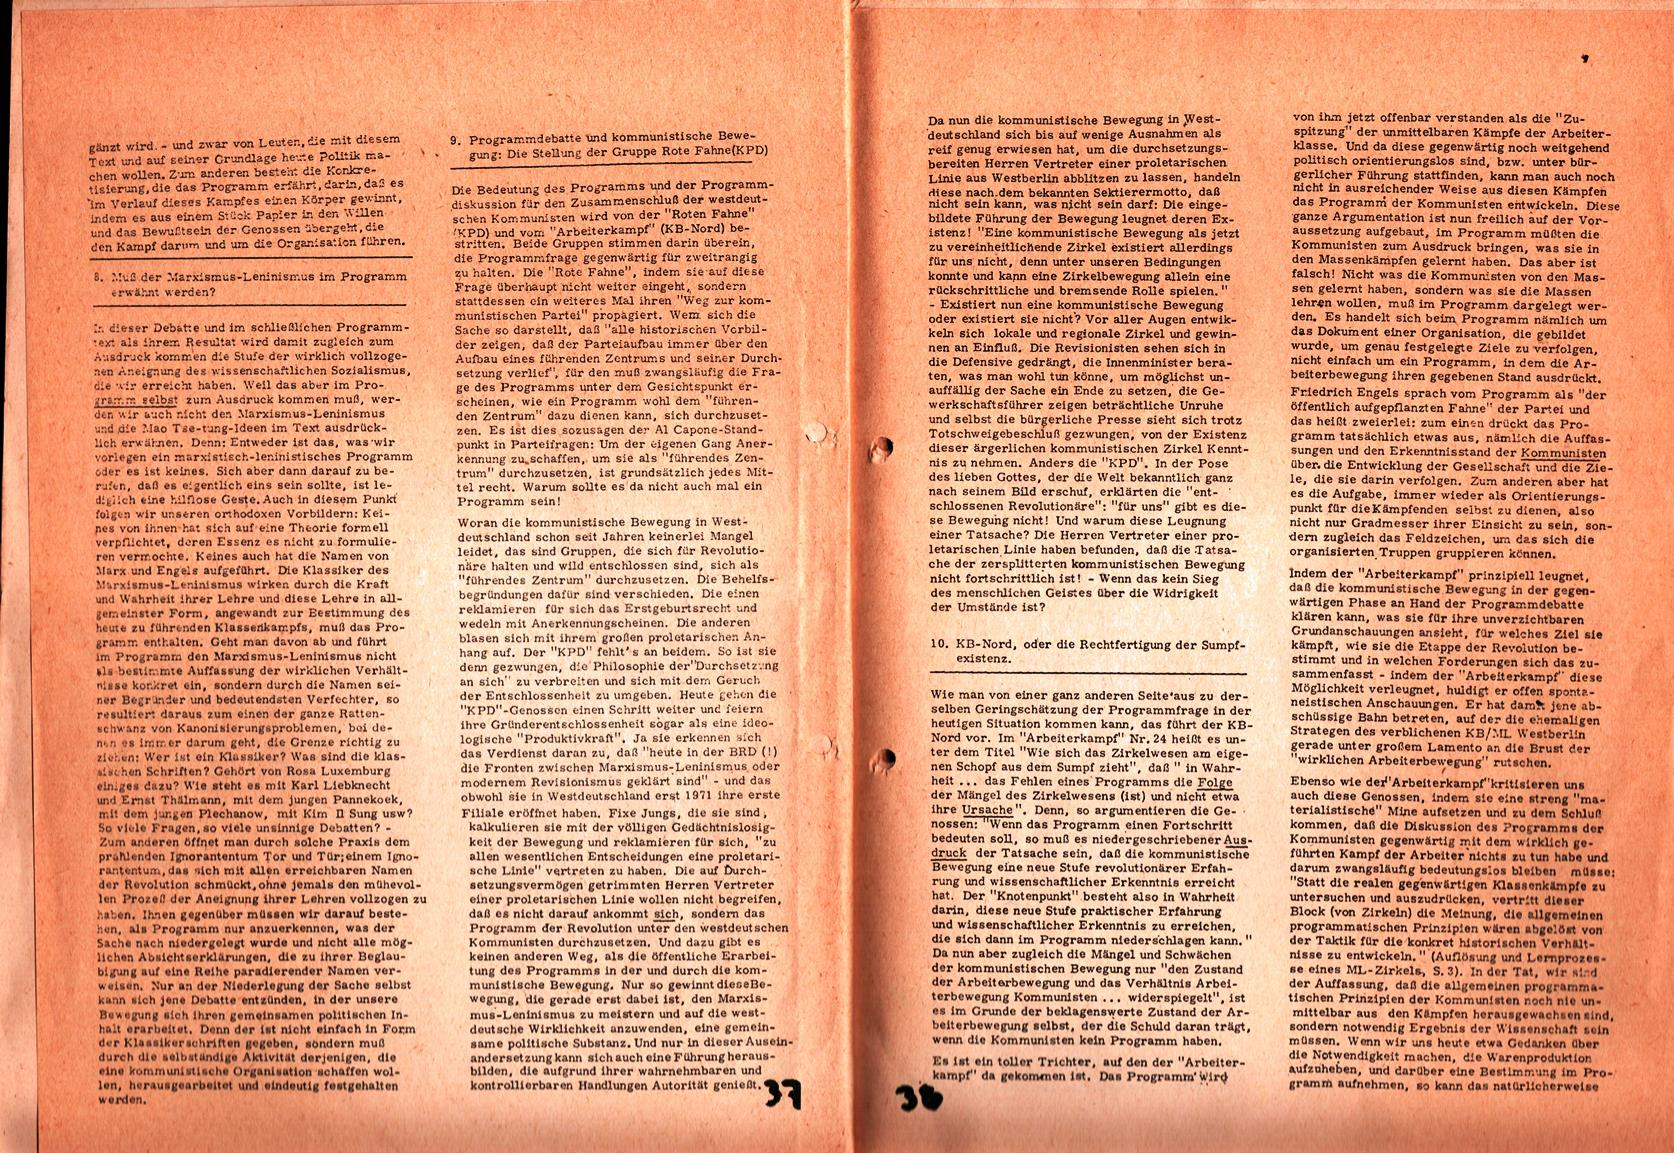 KSV_1974_Materialien_zur_Programmdiskussion_01_020